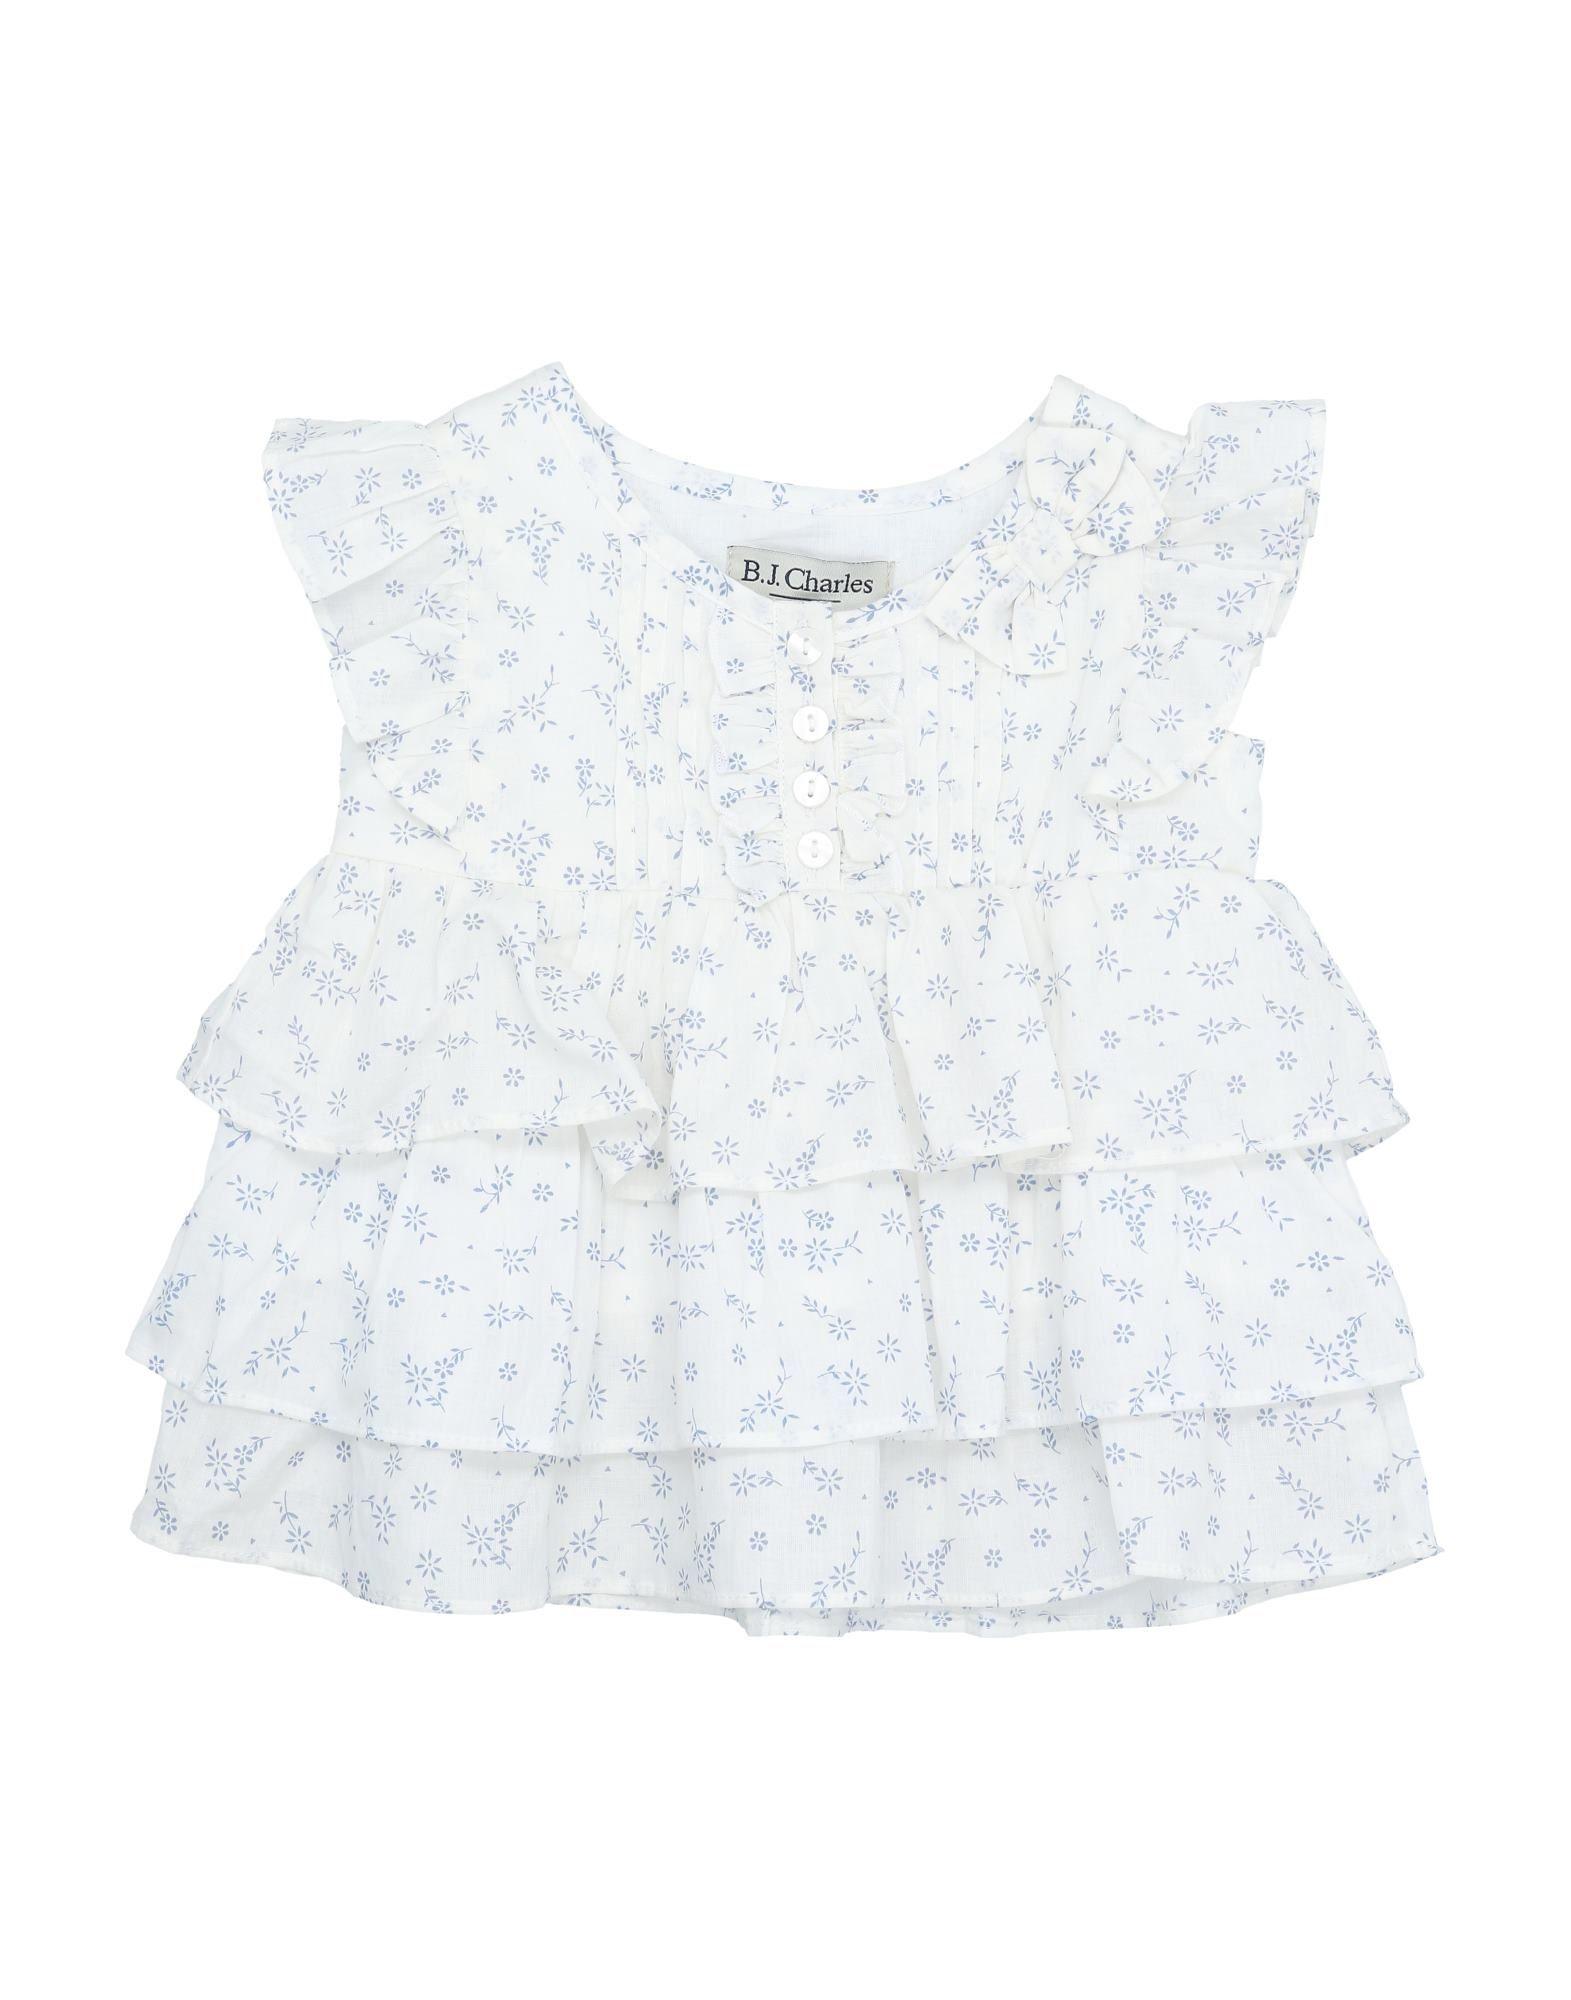 B.j.charles Kids' Bodysuits In White